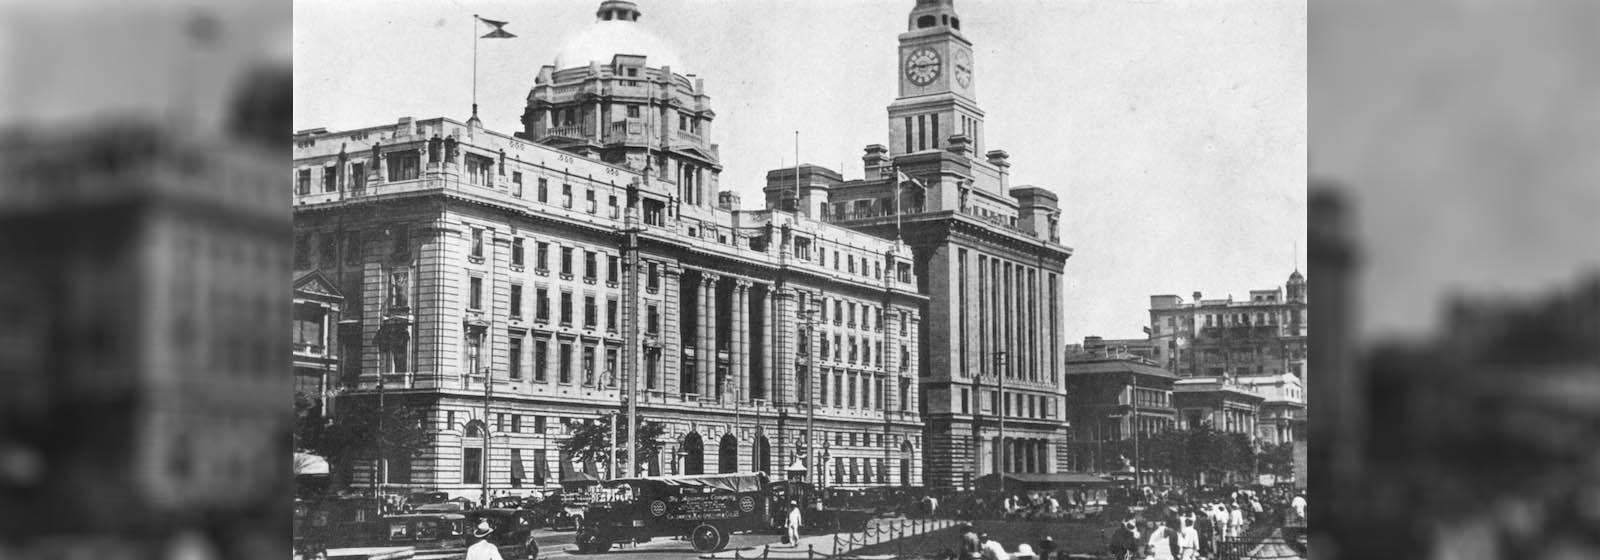 Нескромное здание банка HSBC на Банде